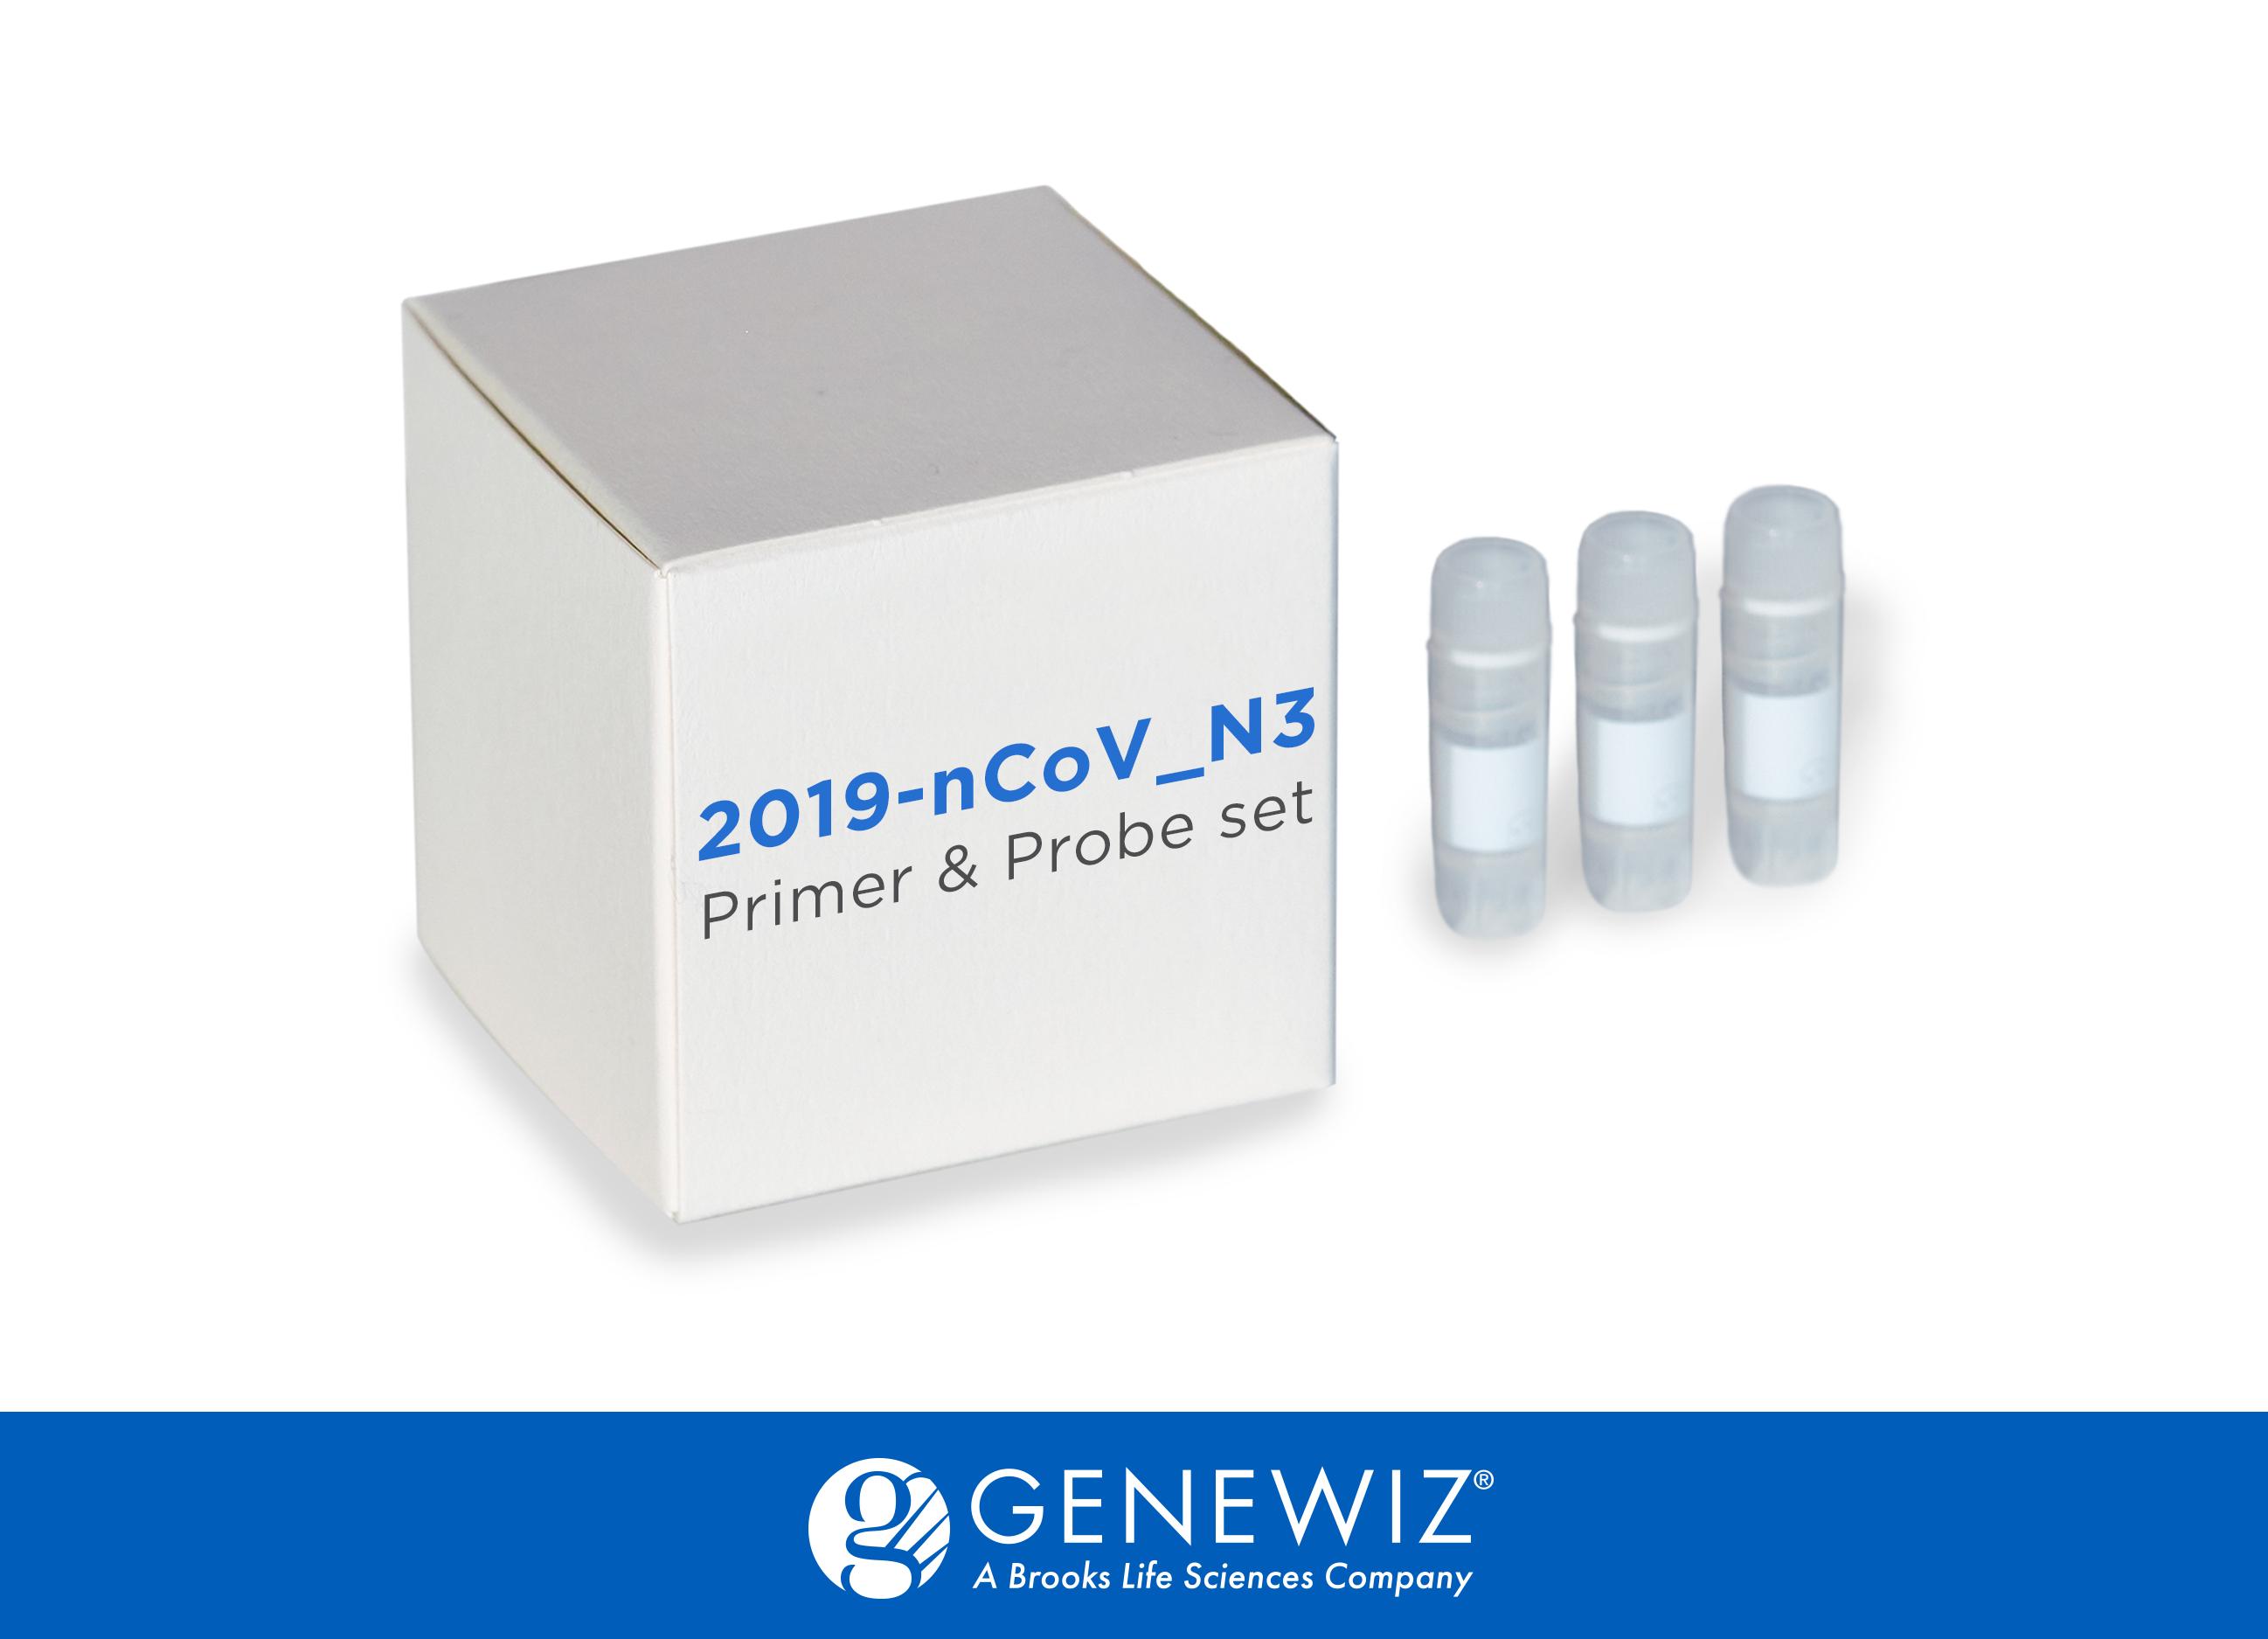 2019-nCoV_N3 Probe and Primer Set